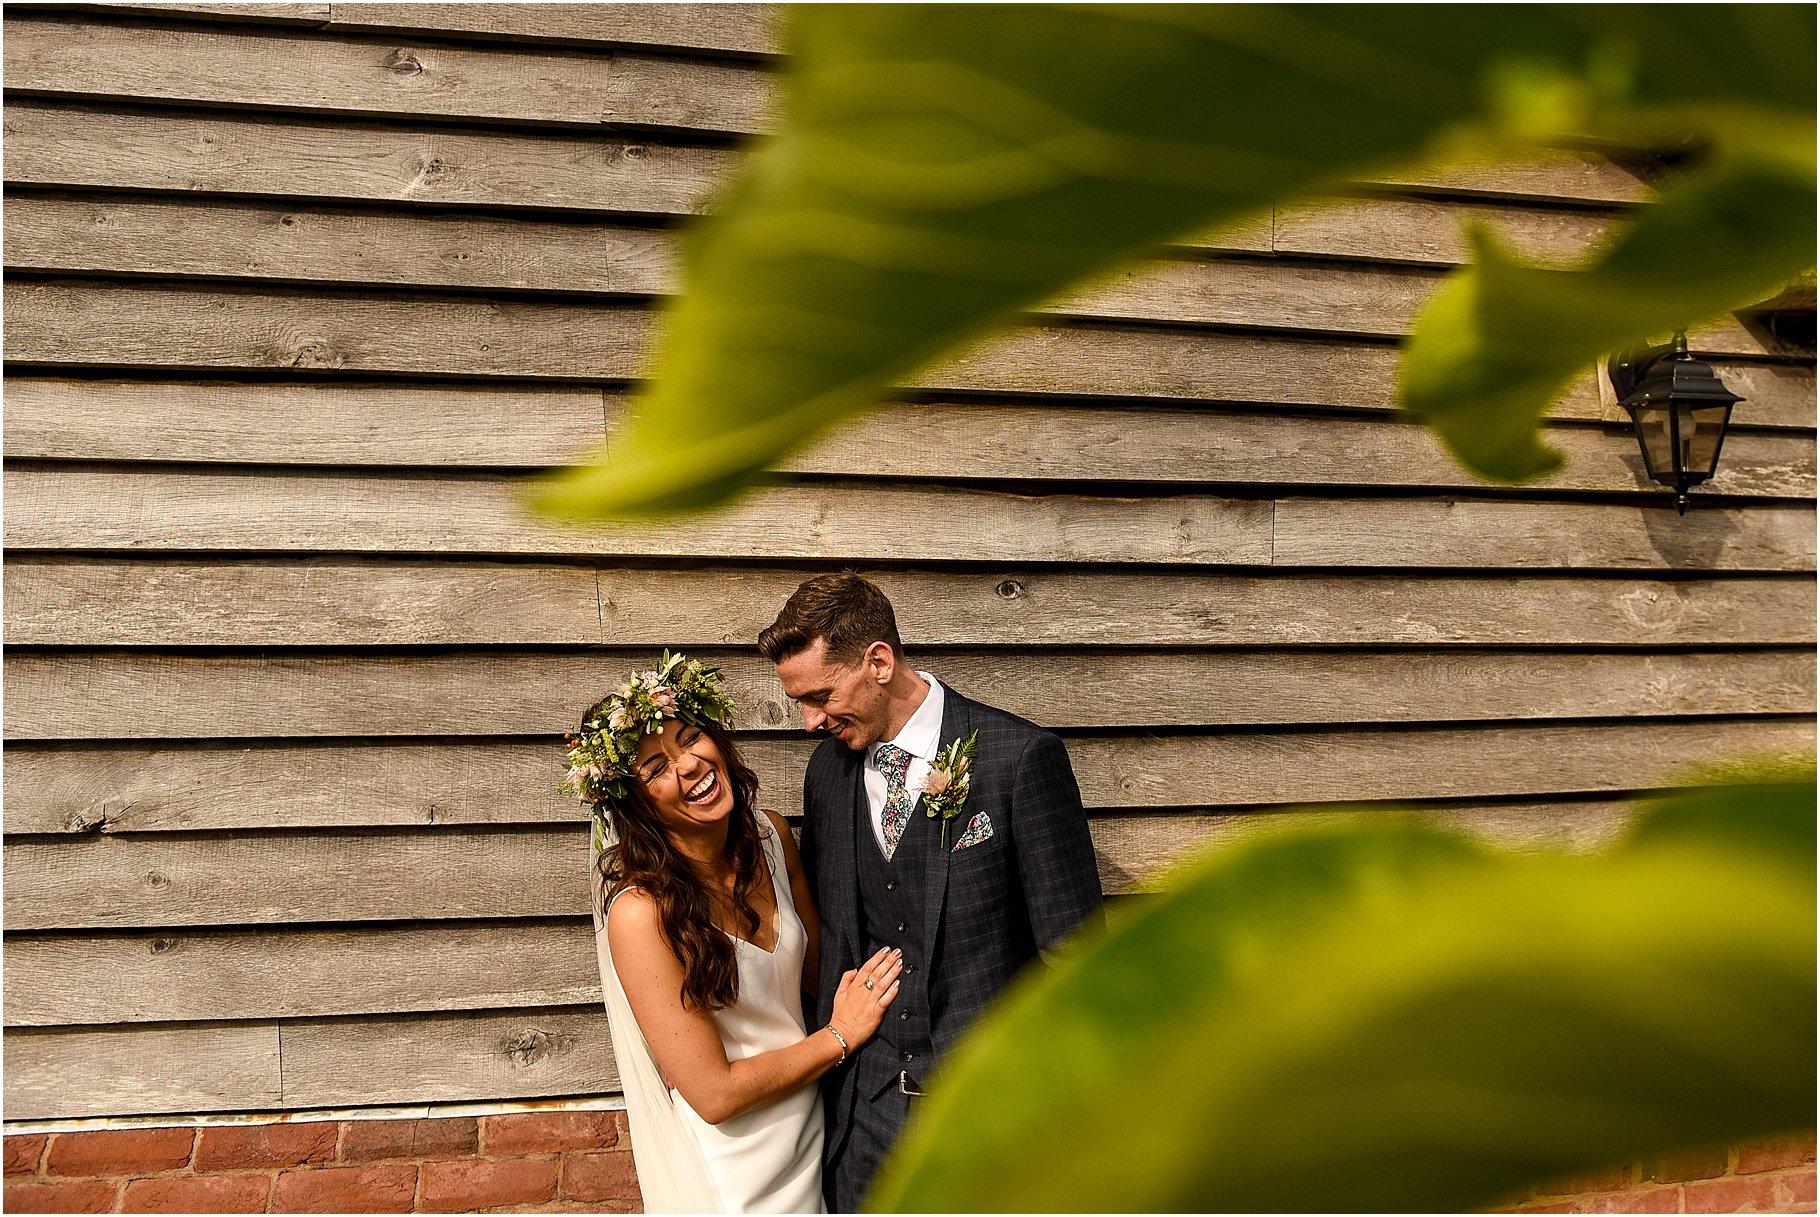 dan-wootton-photography-2017-weddings-004.jpg